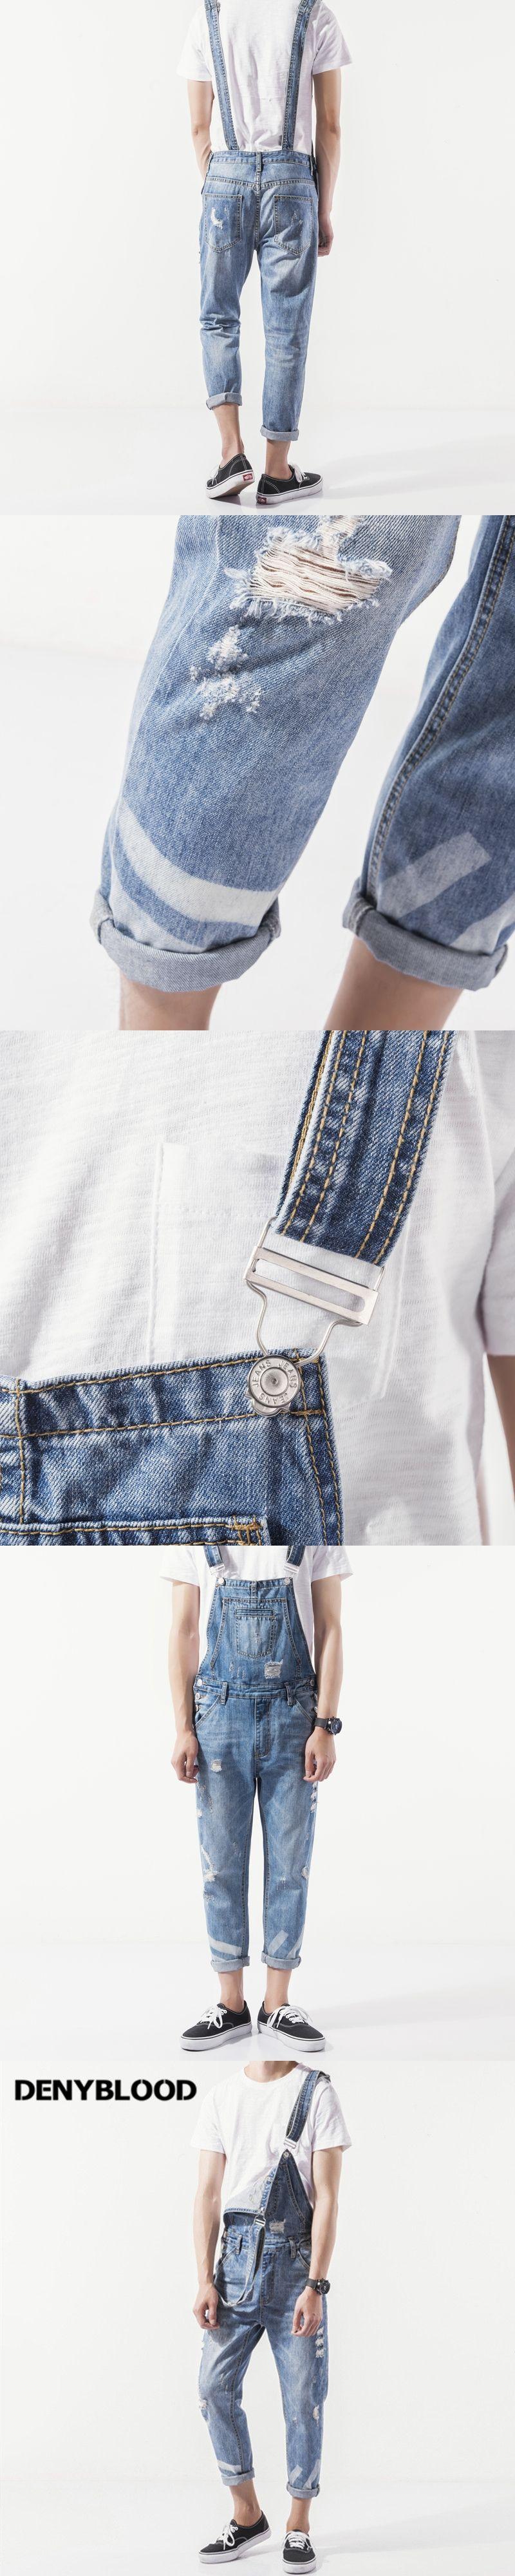 41dd97fbbbe4 Denyblood Jeans Mens Distressed Jeans Ripped Slim Jeans Denim Bib Overalls  Fashion Hole Vintage Washed Jumpsuits